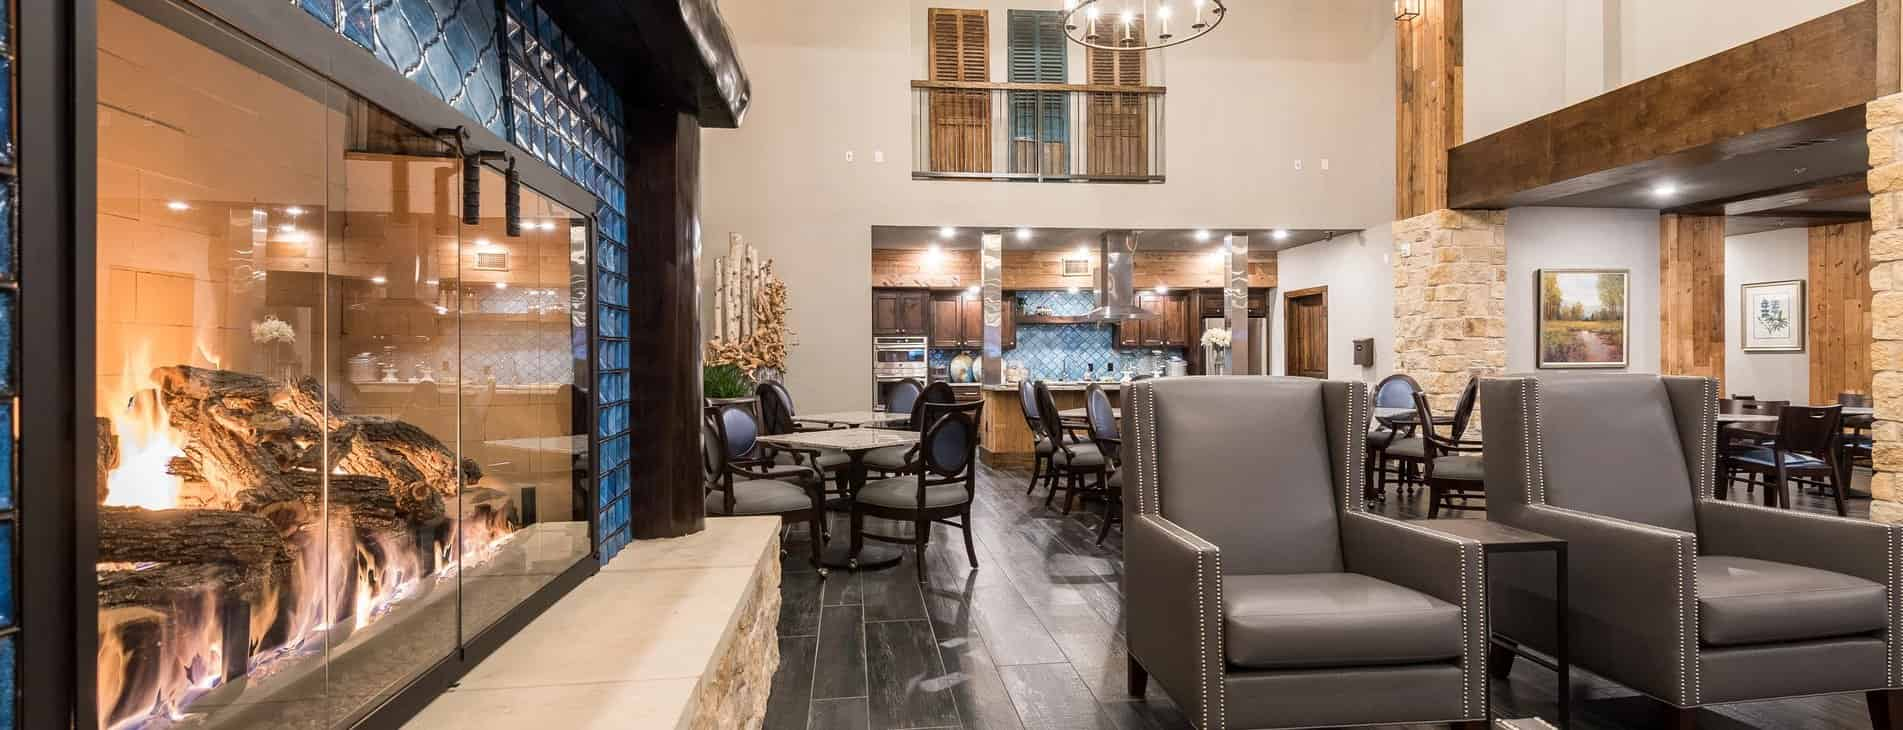 Senior Living Lobby